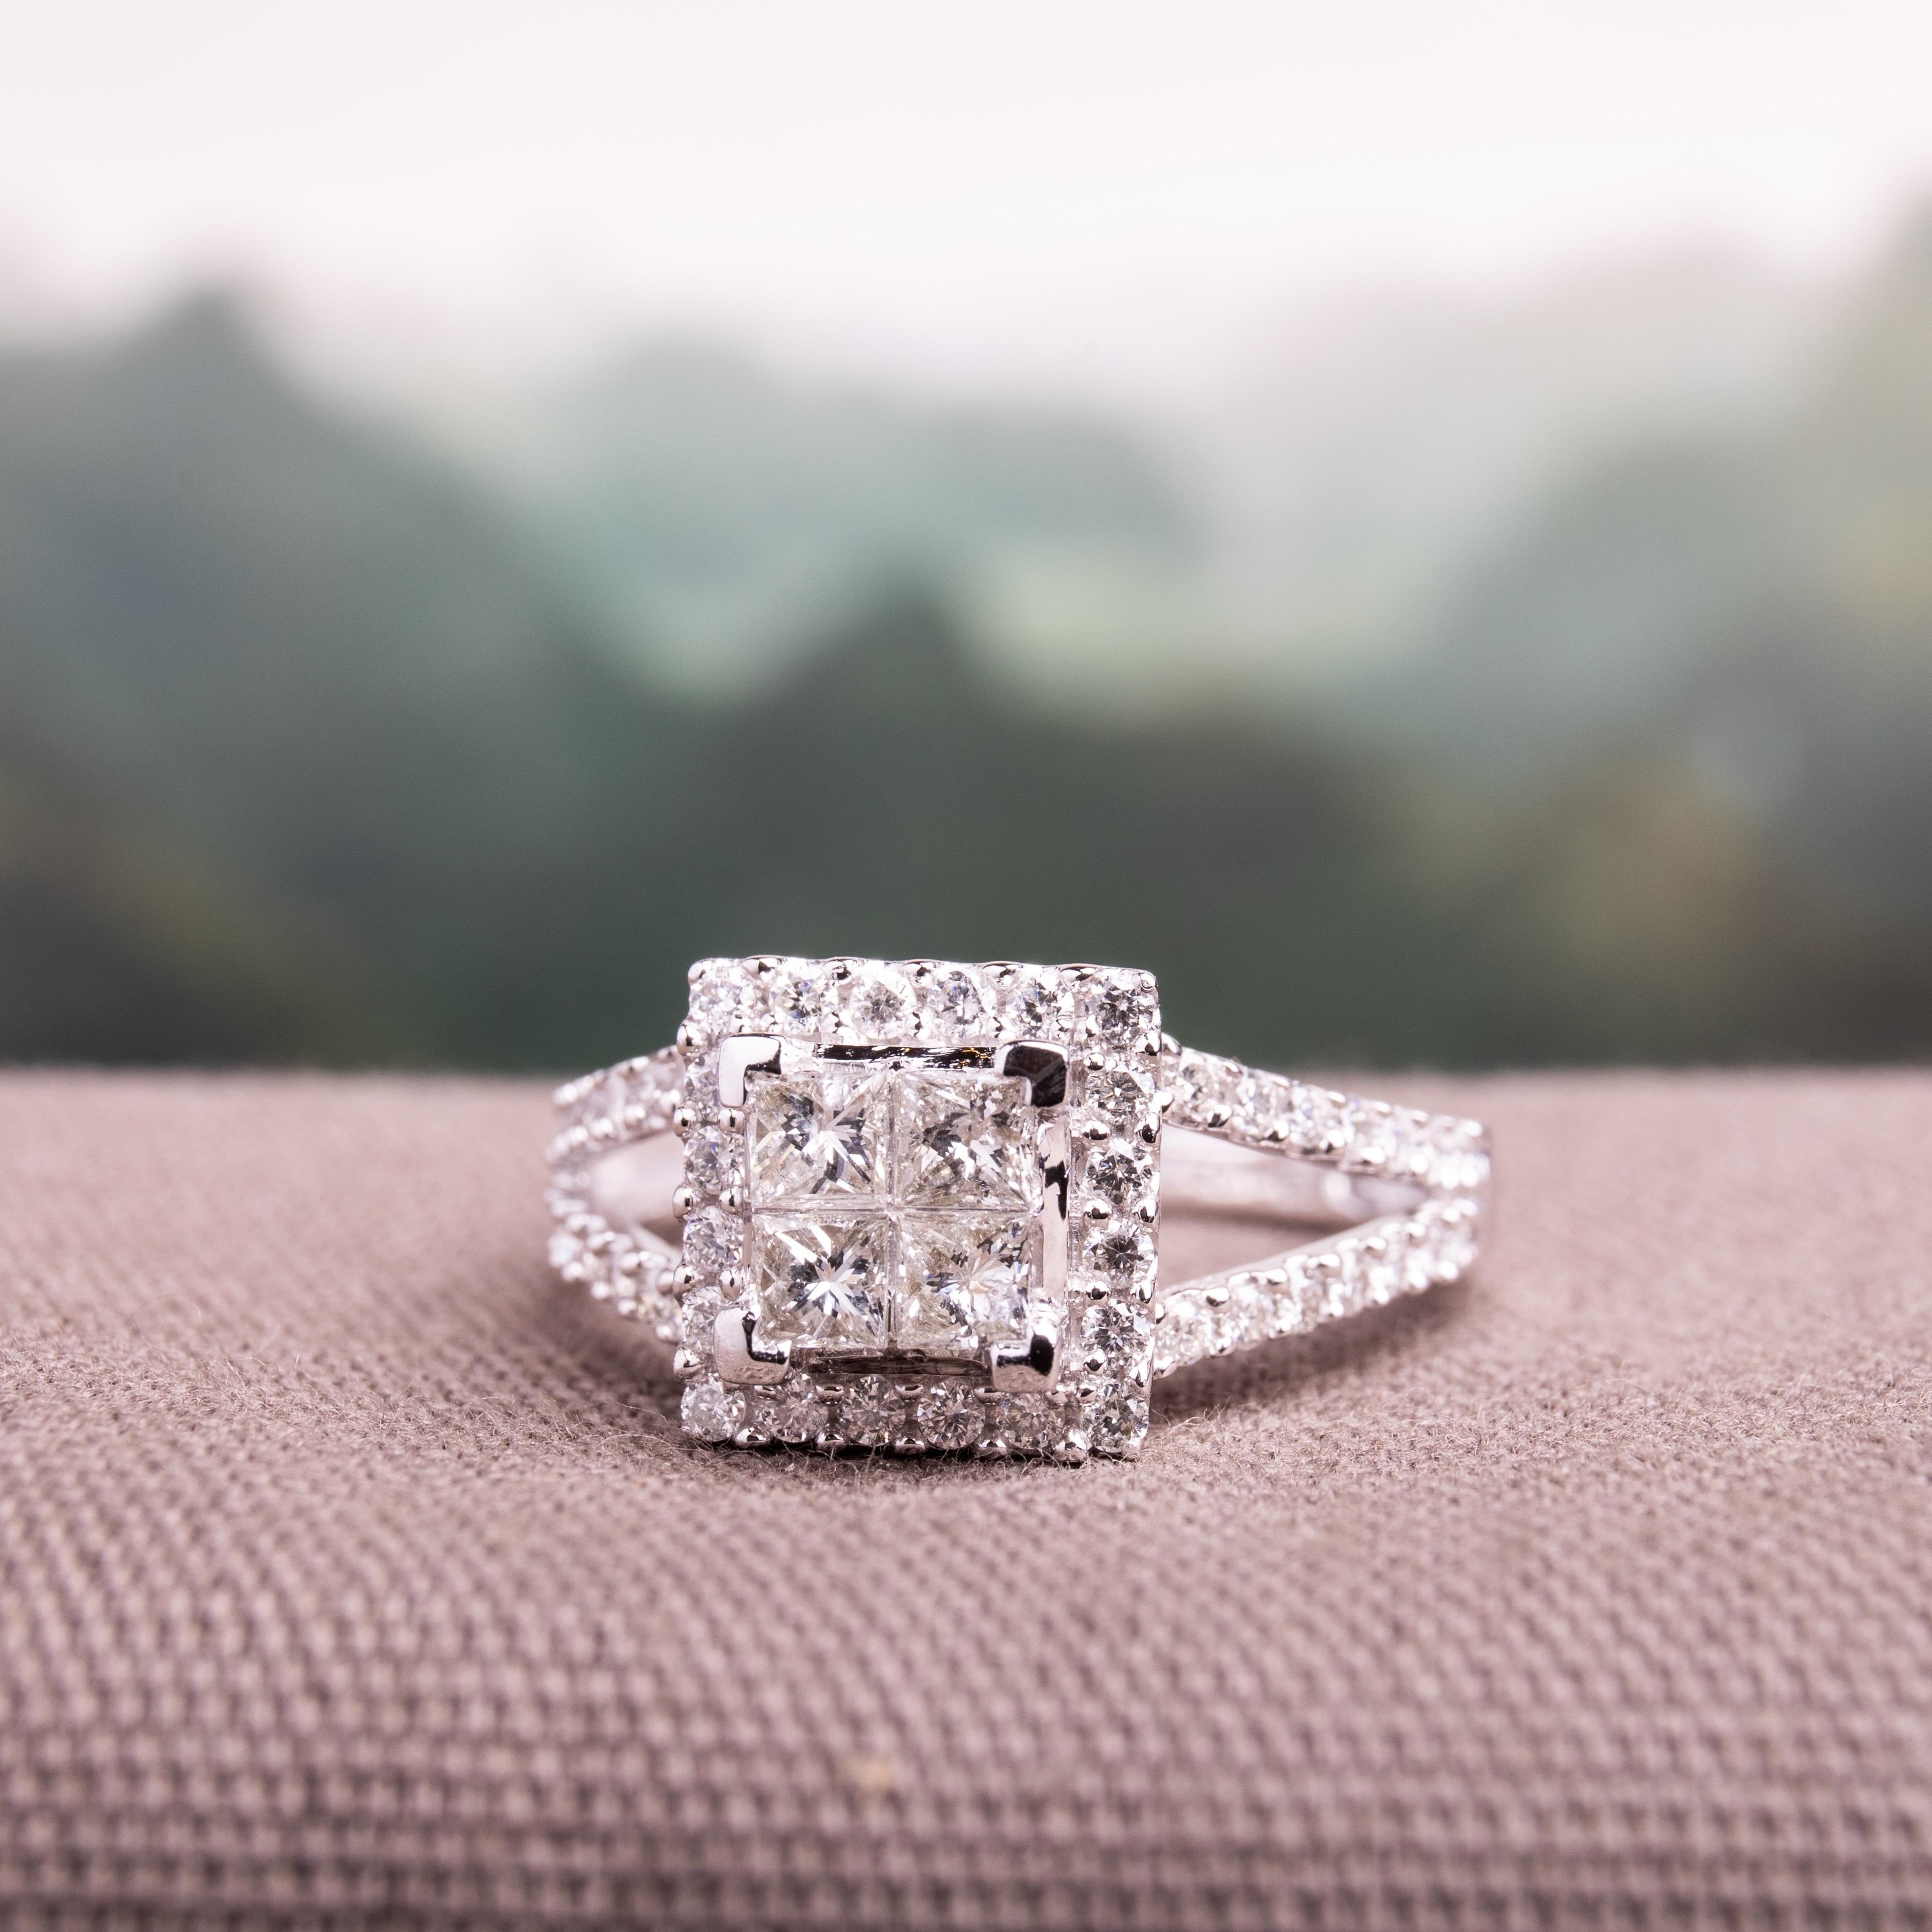 Shop Miadora Signature Collection 14k White Gold 1ct Tdw Diamond Princess Cut Halo Engagement Ring Overstock 4820144